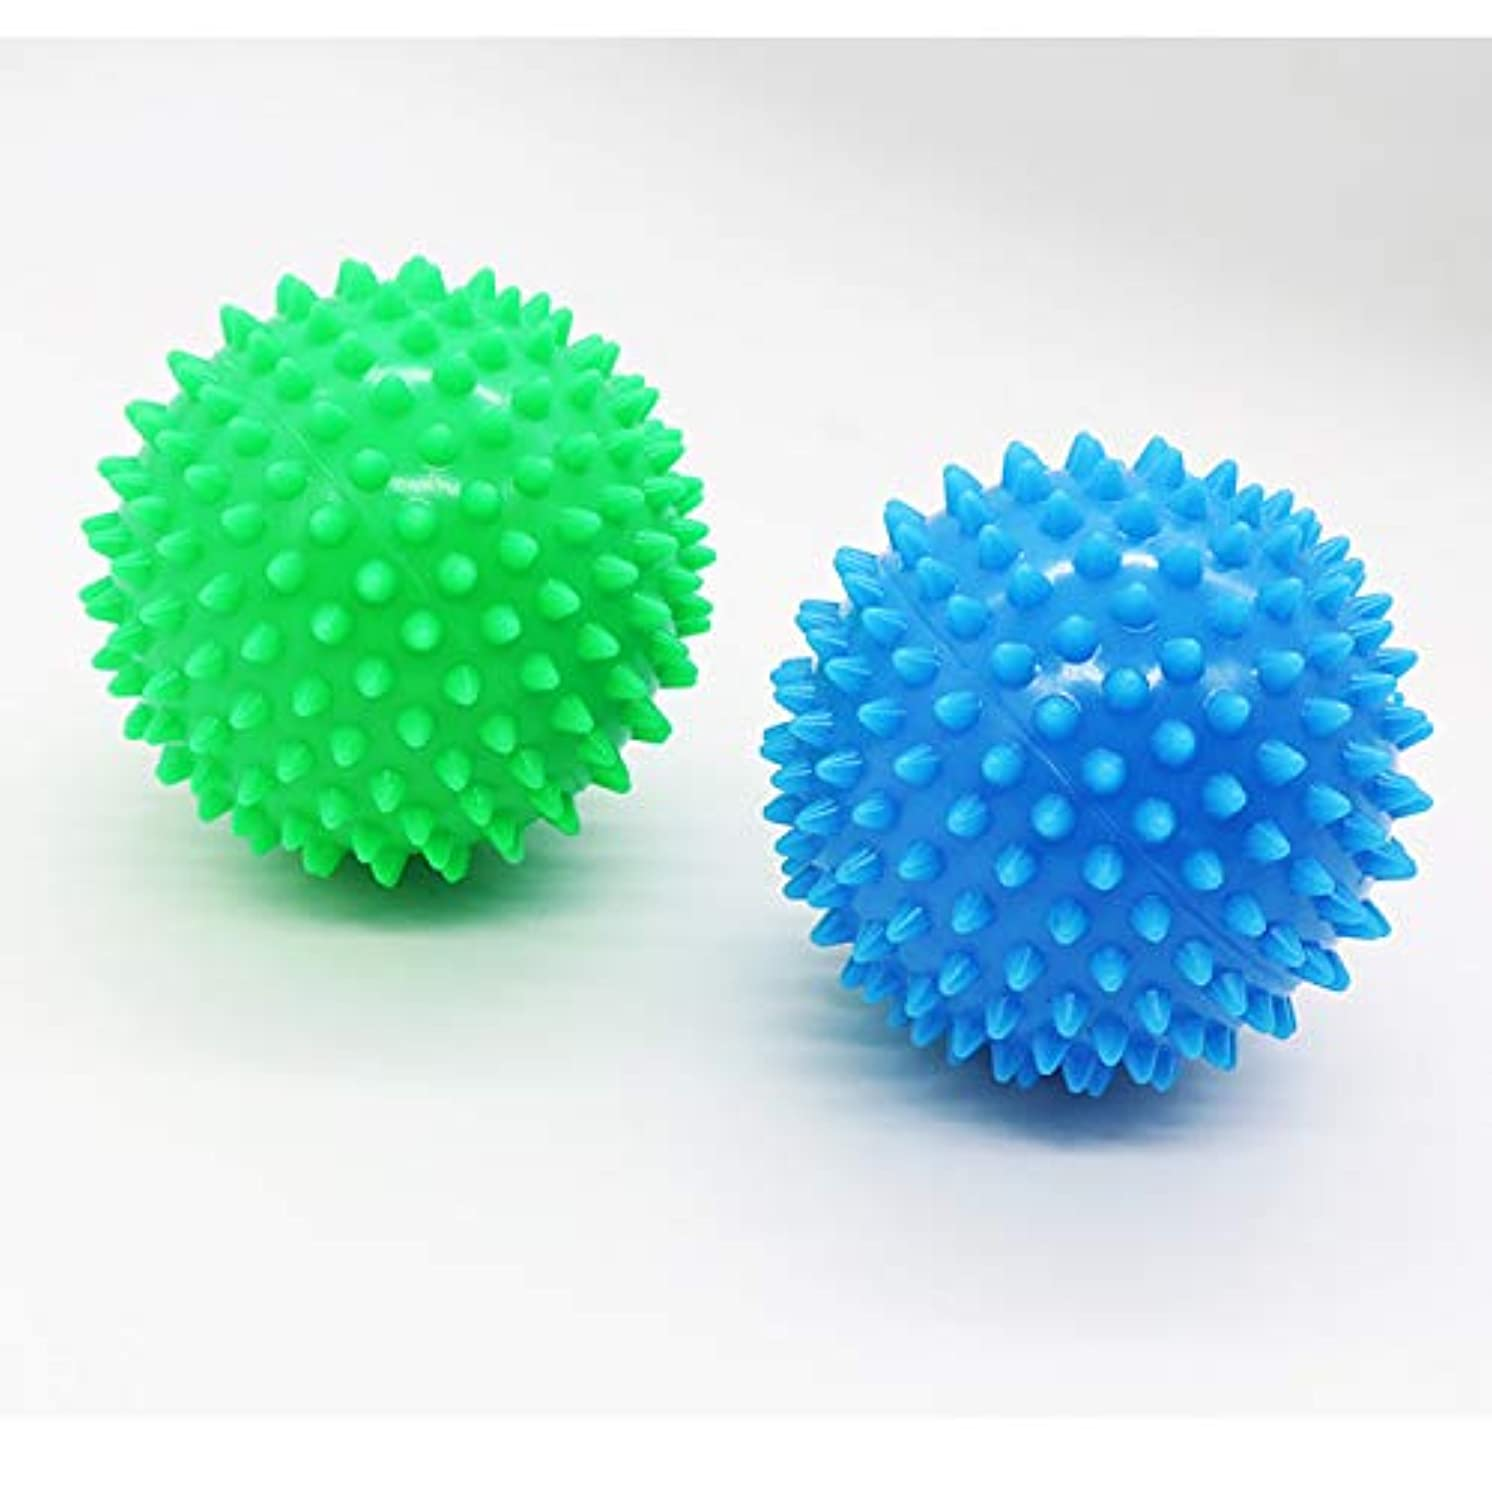 Dreecy マッサージボール(2個セット)触覚ボール リフレックスボール トレーニングボール  ポイントマッサージ 筋筋膜リリース 筋肉緊張和らげ 血液循環促進 9cm(青+緑)